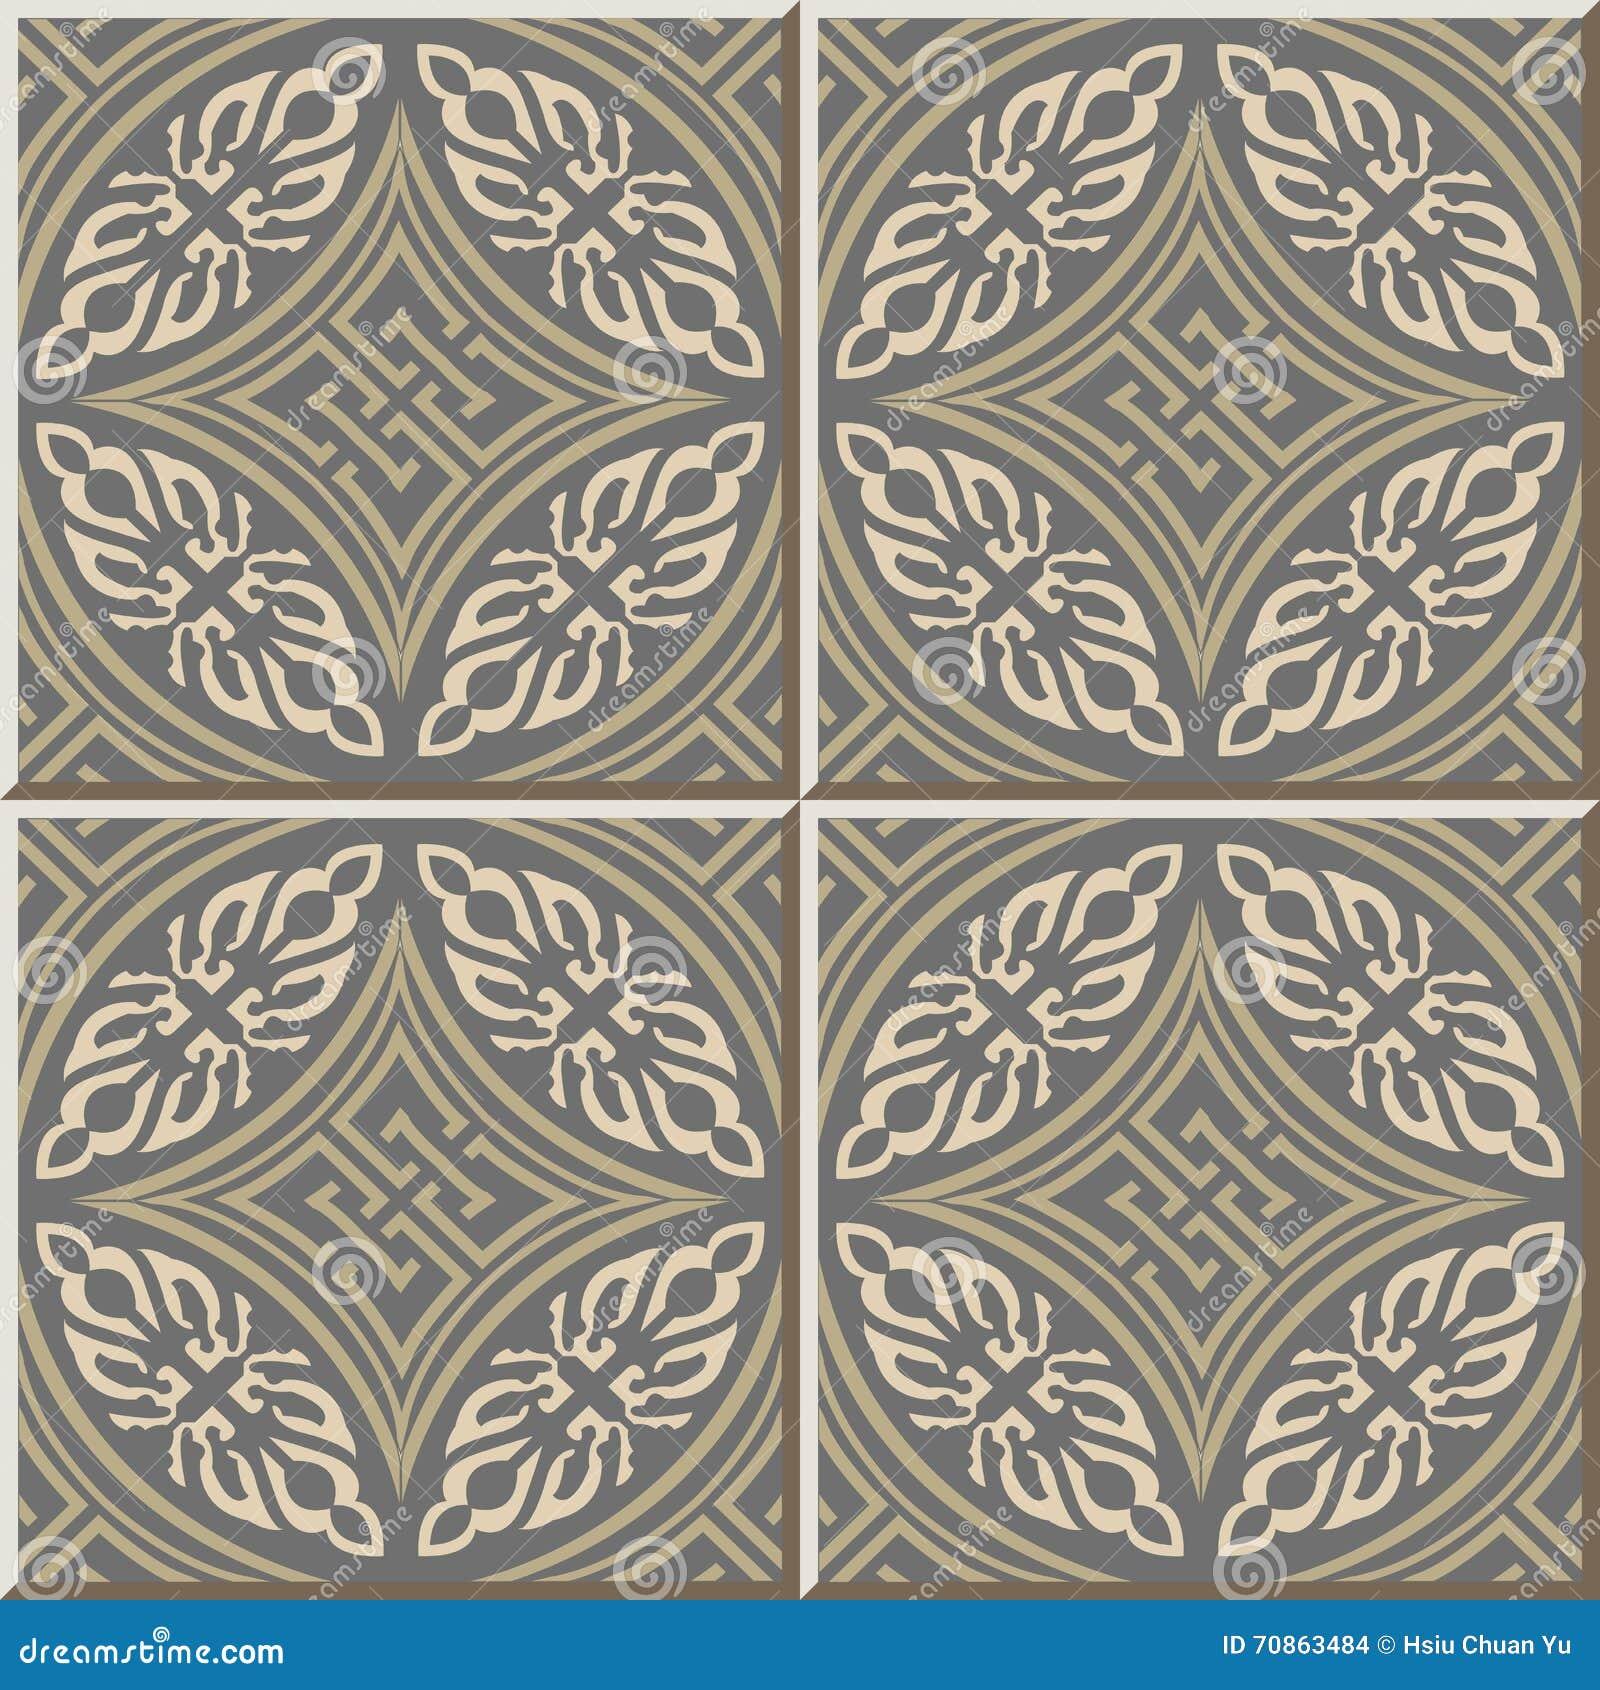 Ceramic Tile Pattern 336 Round Aboriginal Cross Geometry Stock ...